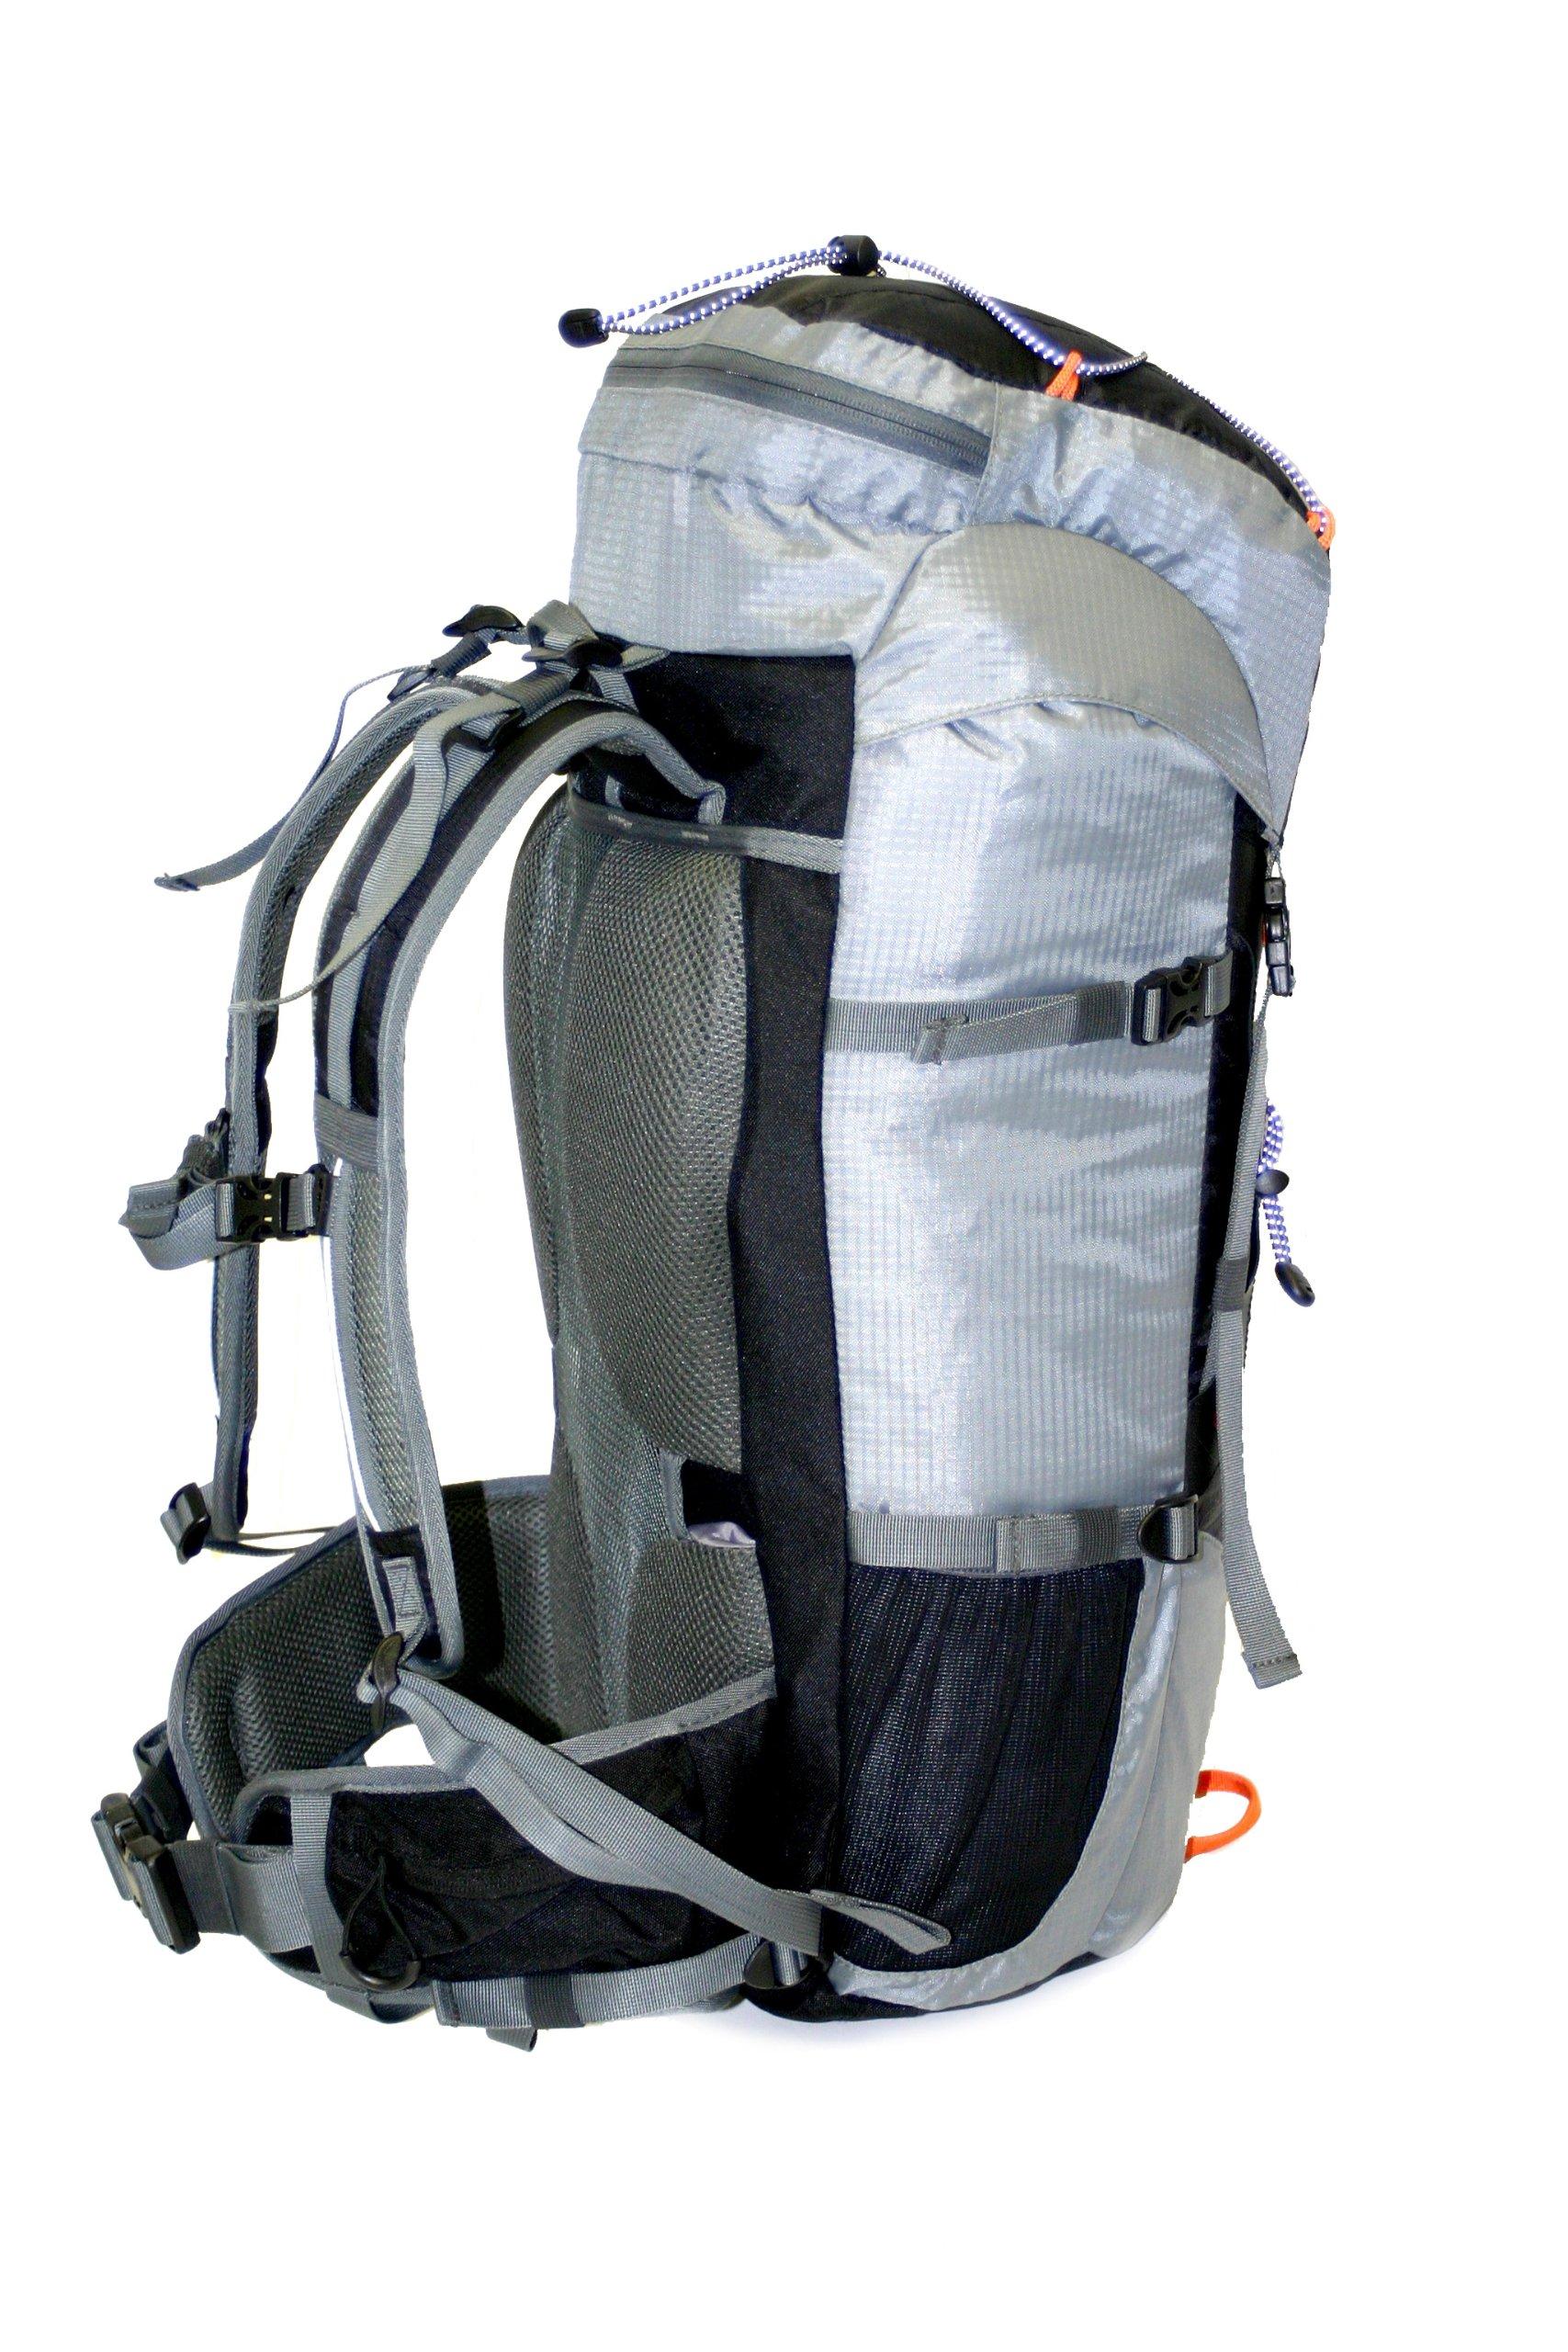 91XLDCLa2OL - MONTIS Leman 45, Mochila de Ruta, Trekking y Viajes, 45 l, 1300 g